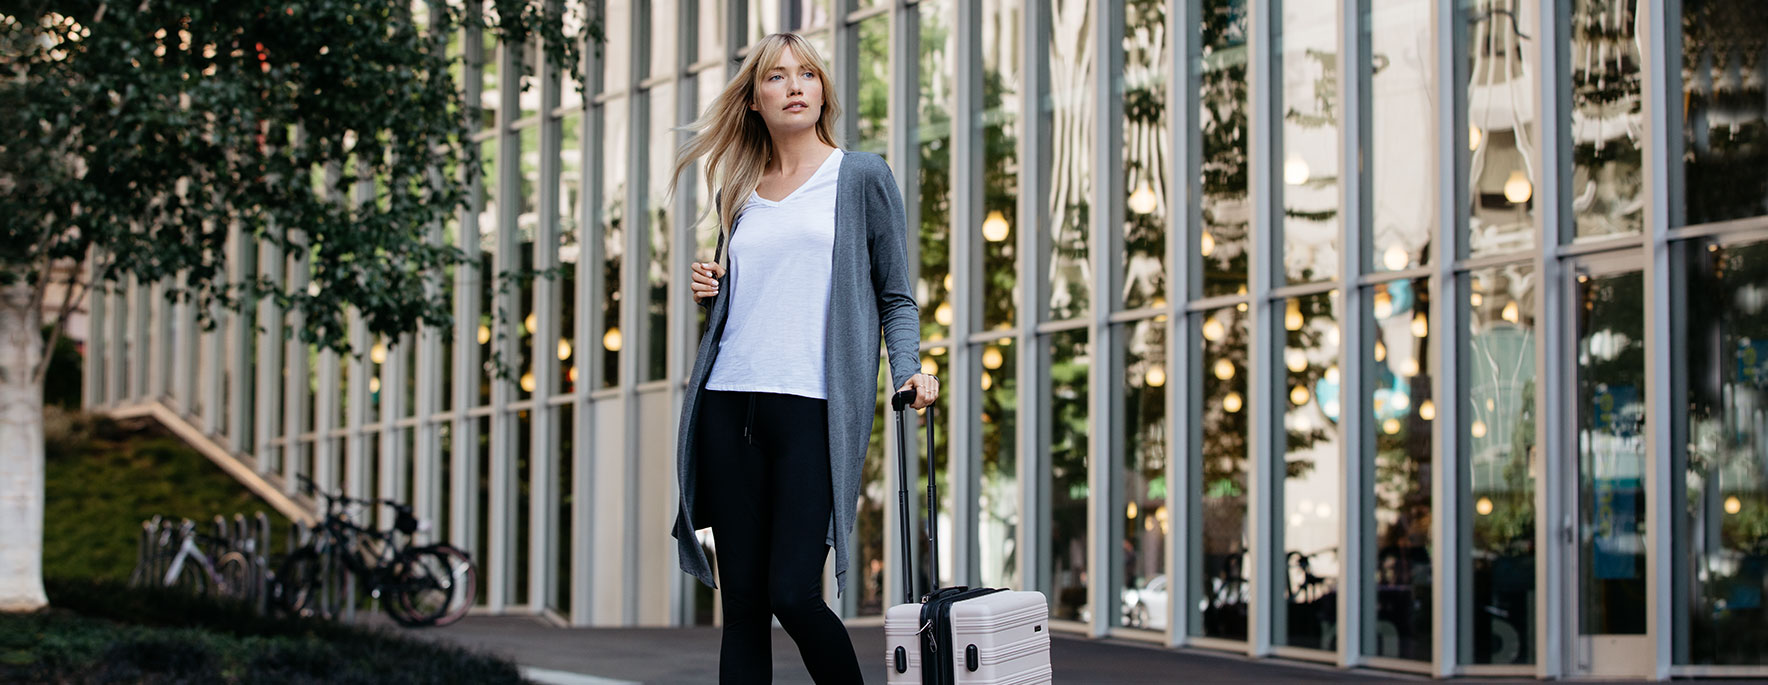 womens travel shirts and pants - tasc performance